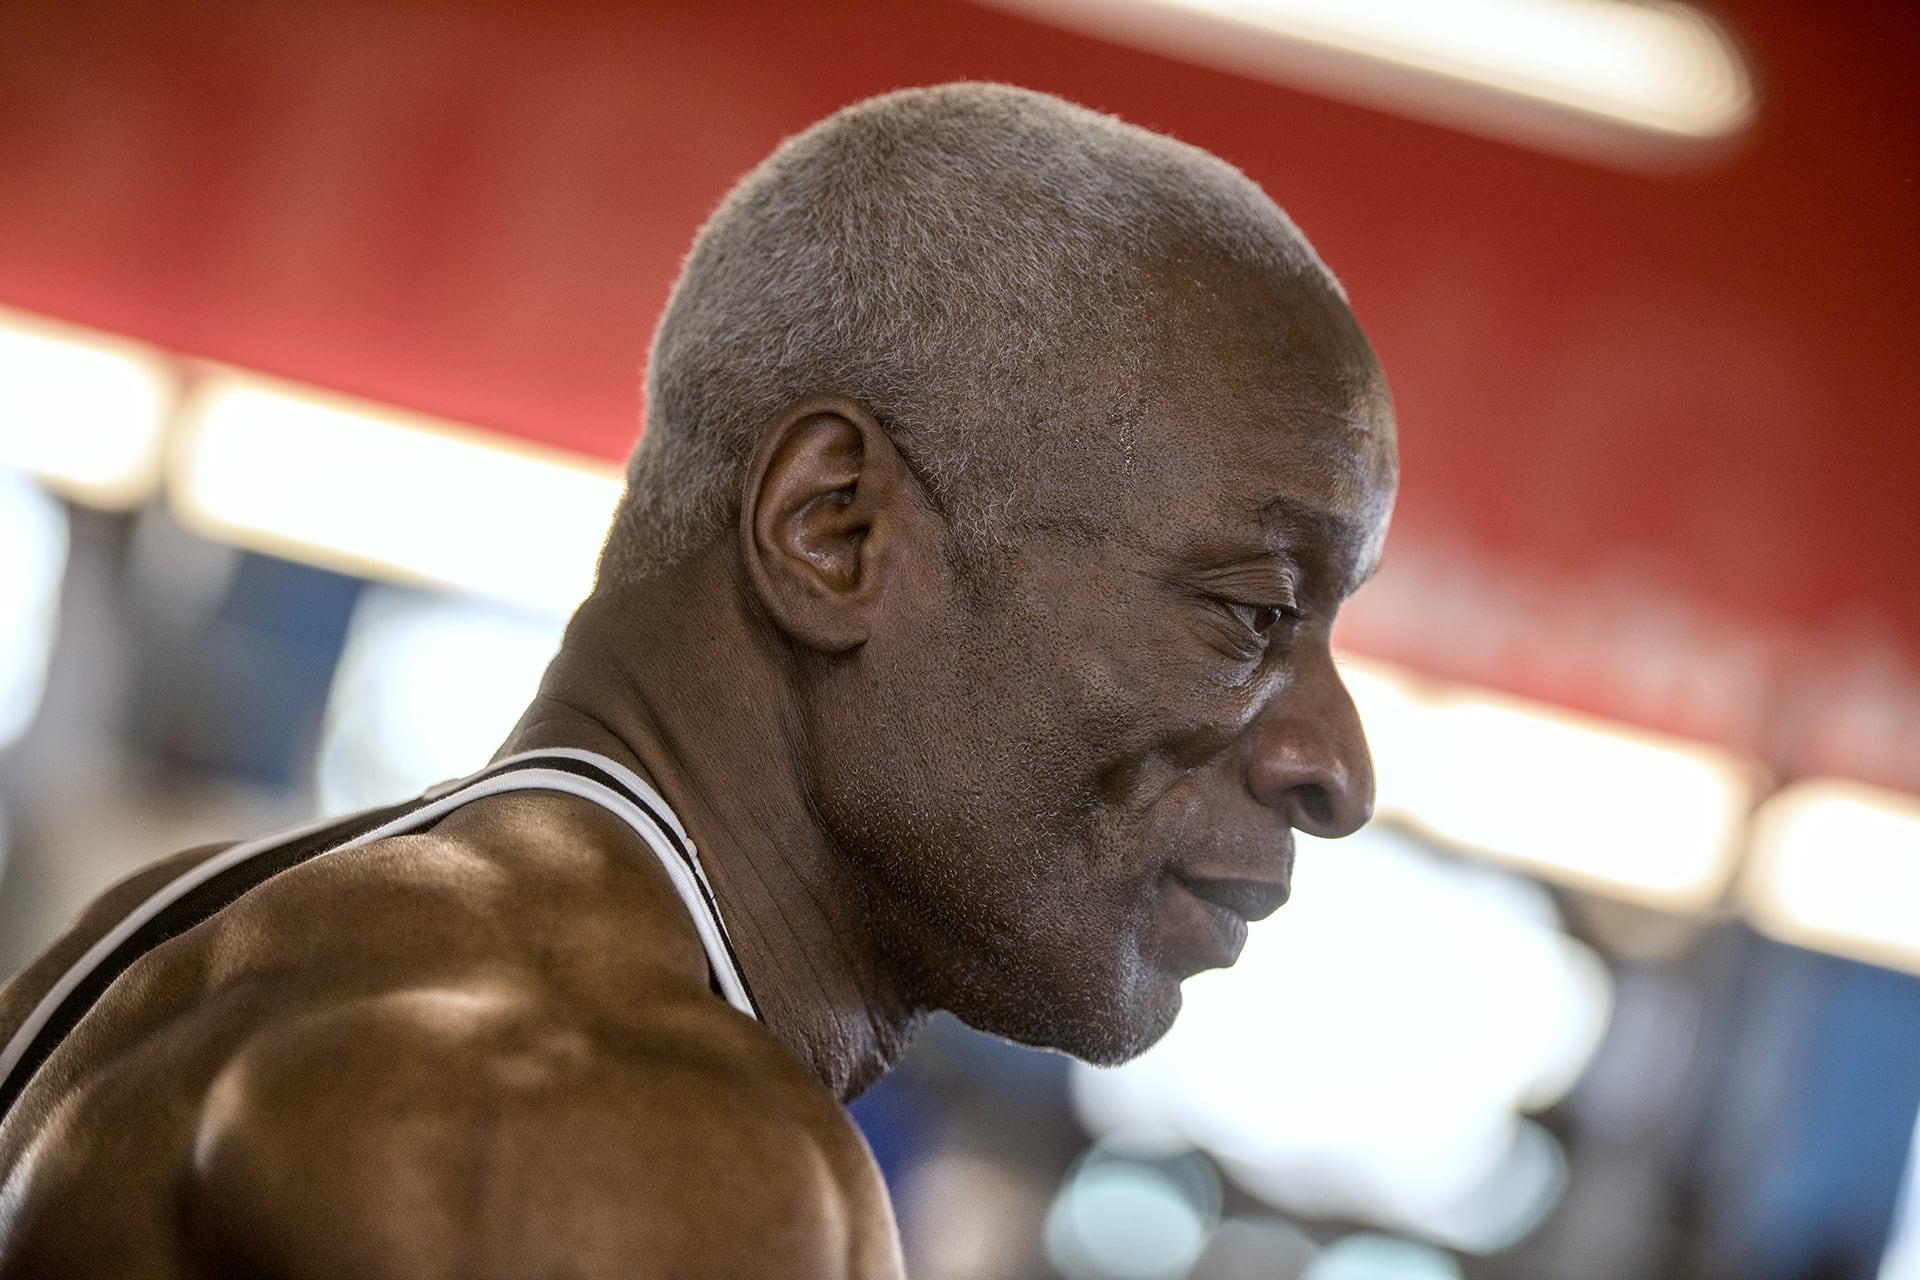 Donald at Gym